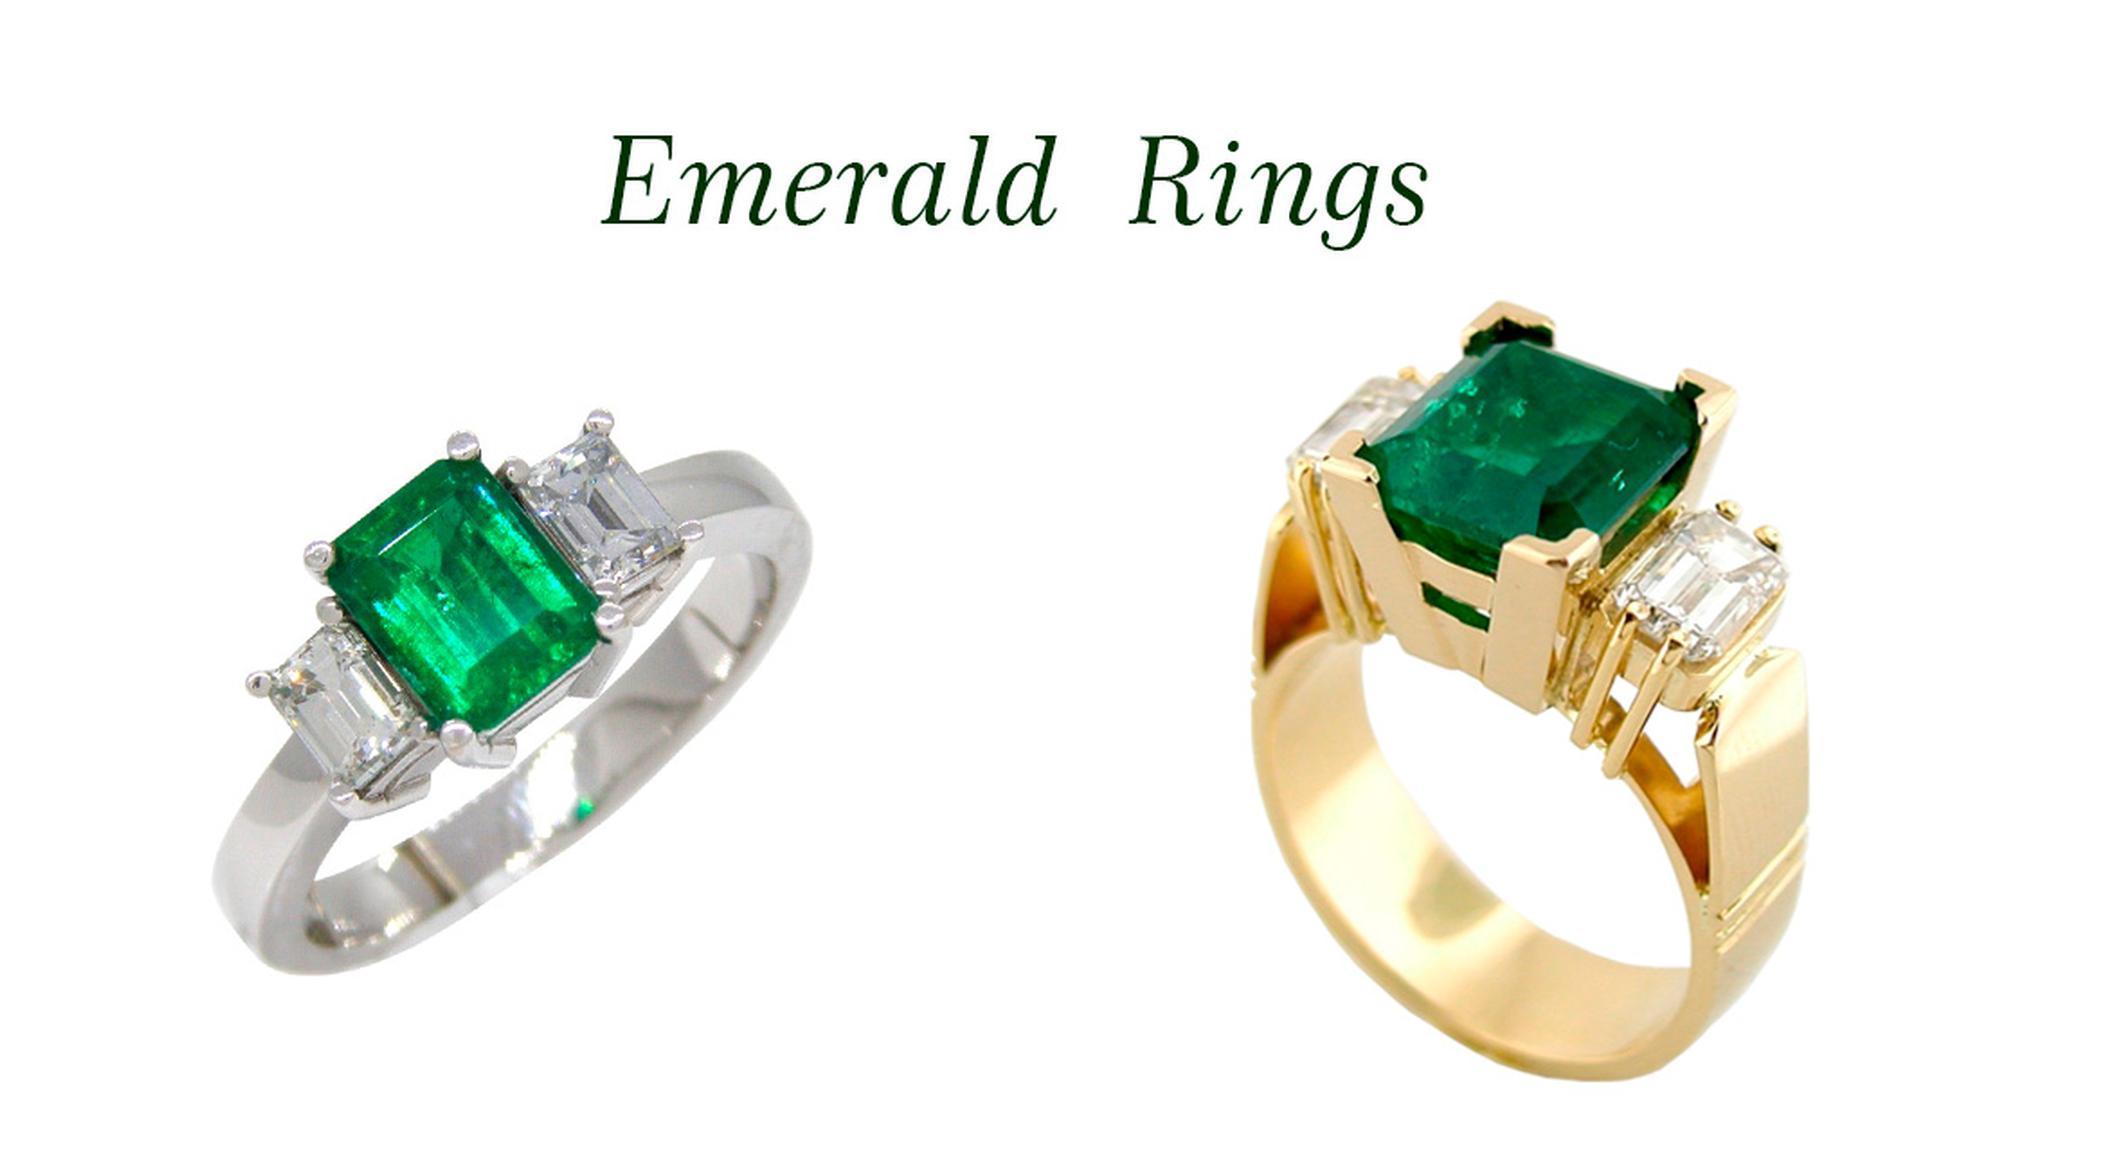 Emerald Rings